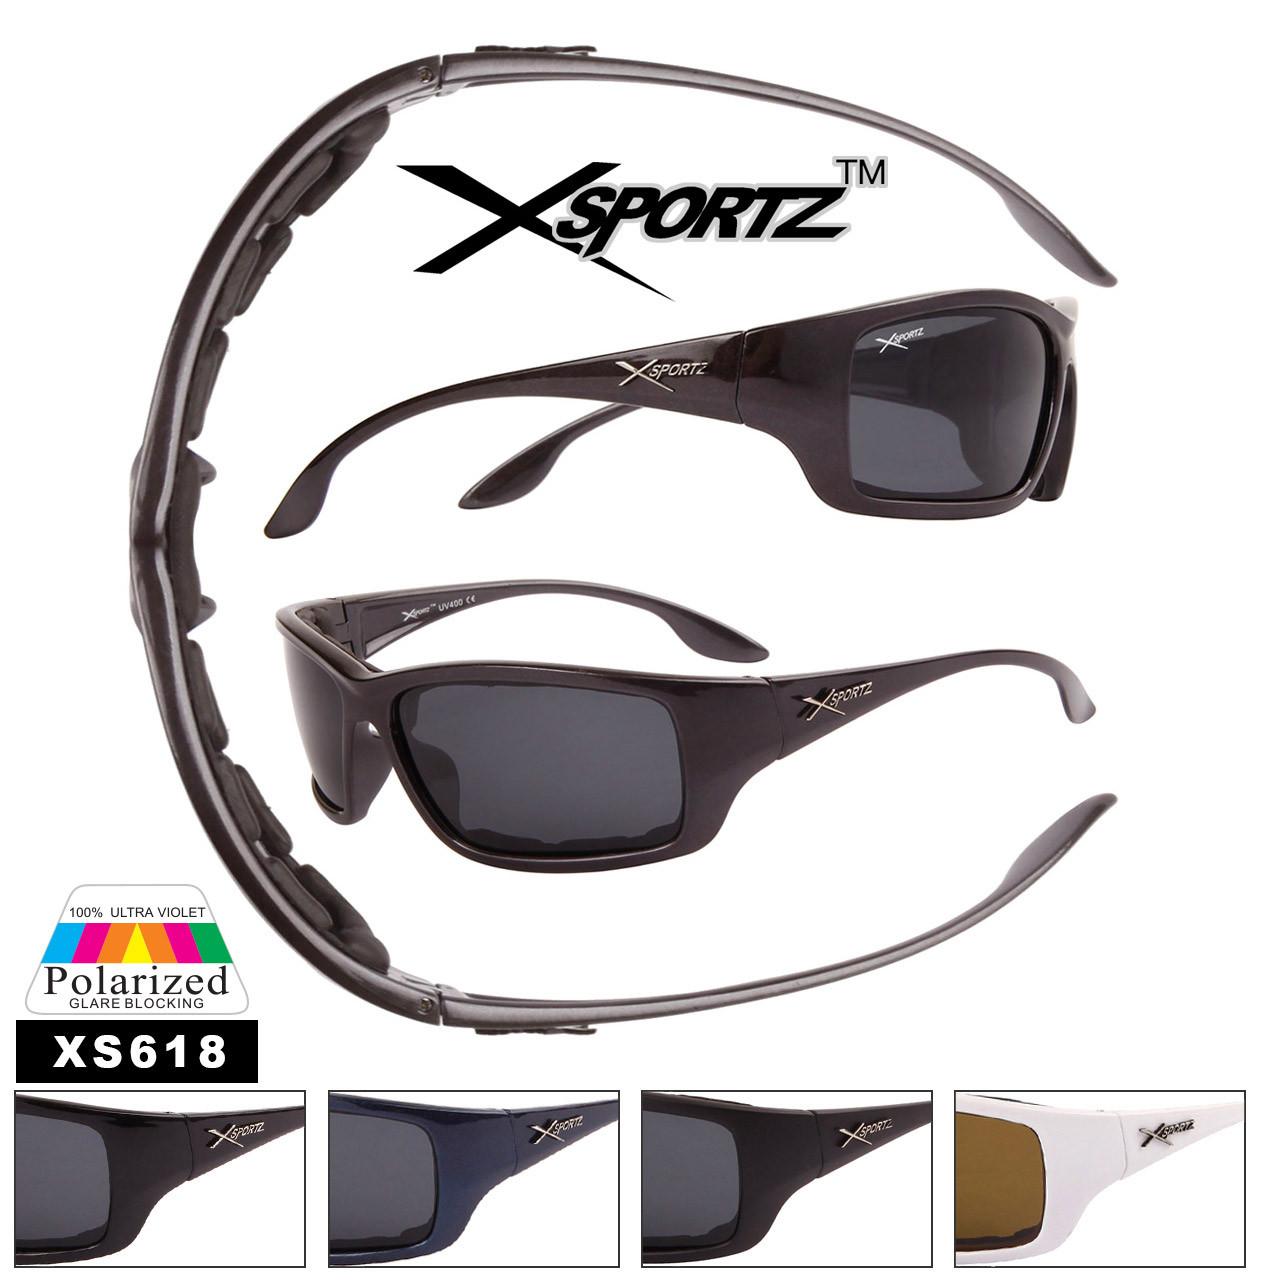 Men's Polarized Xsportz ™ Sunglasses - Style #XS618 Foam Padded